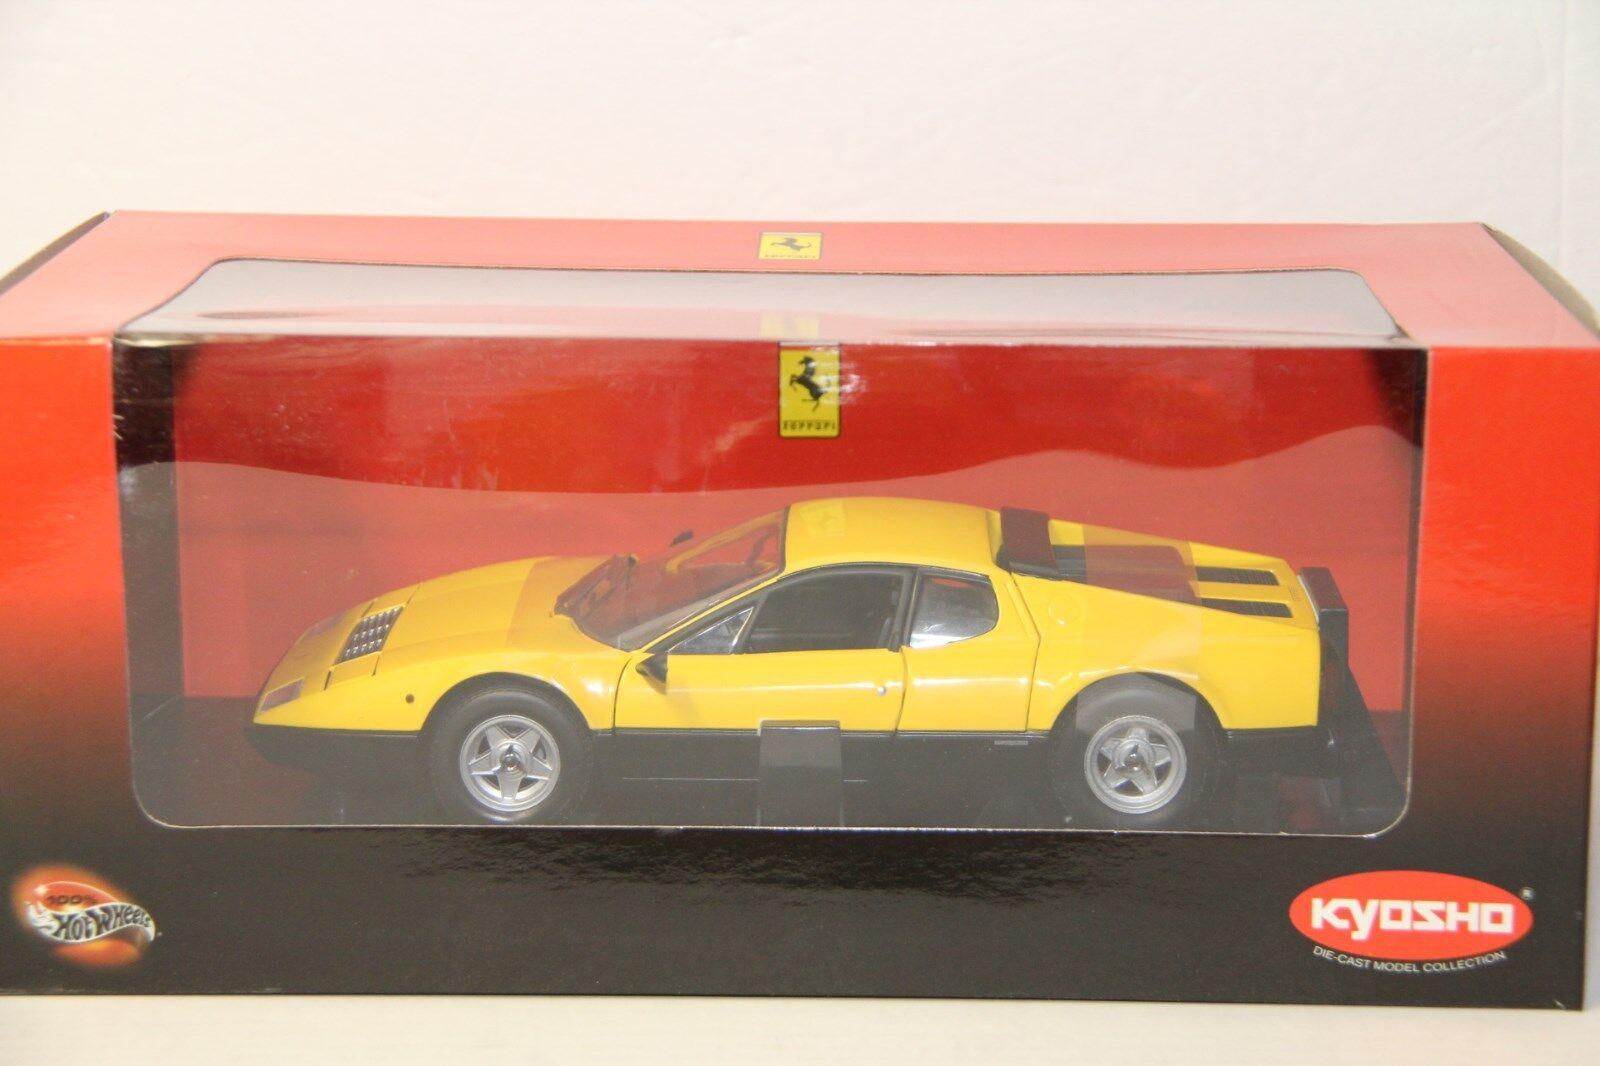 1/18 Kyosho Ferrari 365GT4/BB, Nuevo, 08173Y, Amarillo